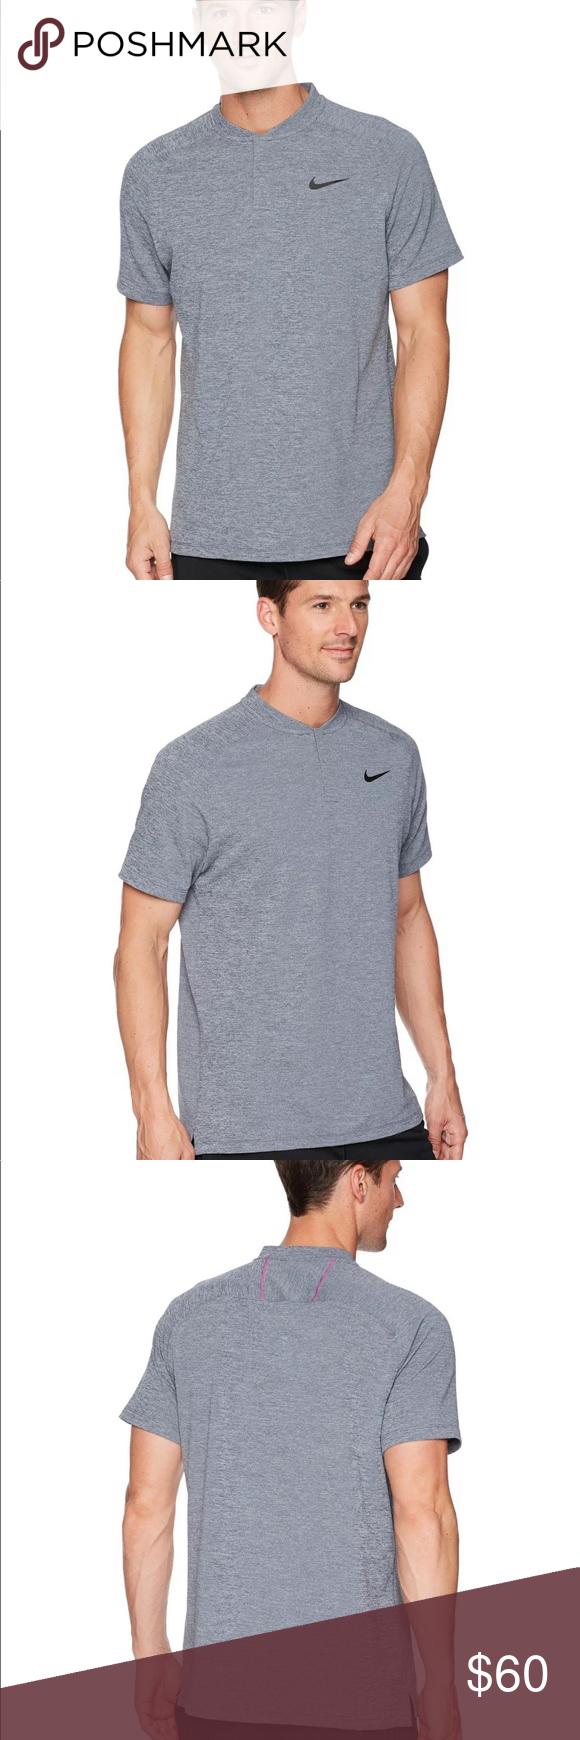 7ecd9a2a Men's Nike AeroReact Momentum Golf Blade Polo NIKE AEROREACT MOMENTUM SLIM  FIT GOLF POLO SHIRT MEN'S SIZE: M, MEDIUM Color: thunder blue heather /  hyper ...